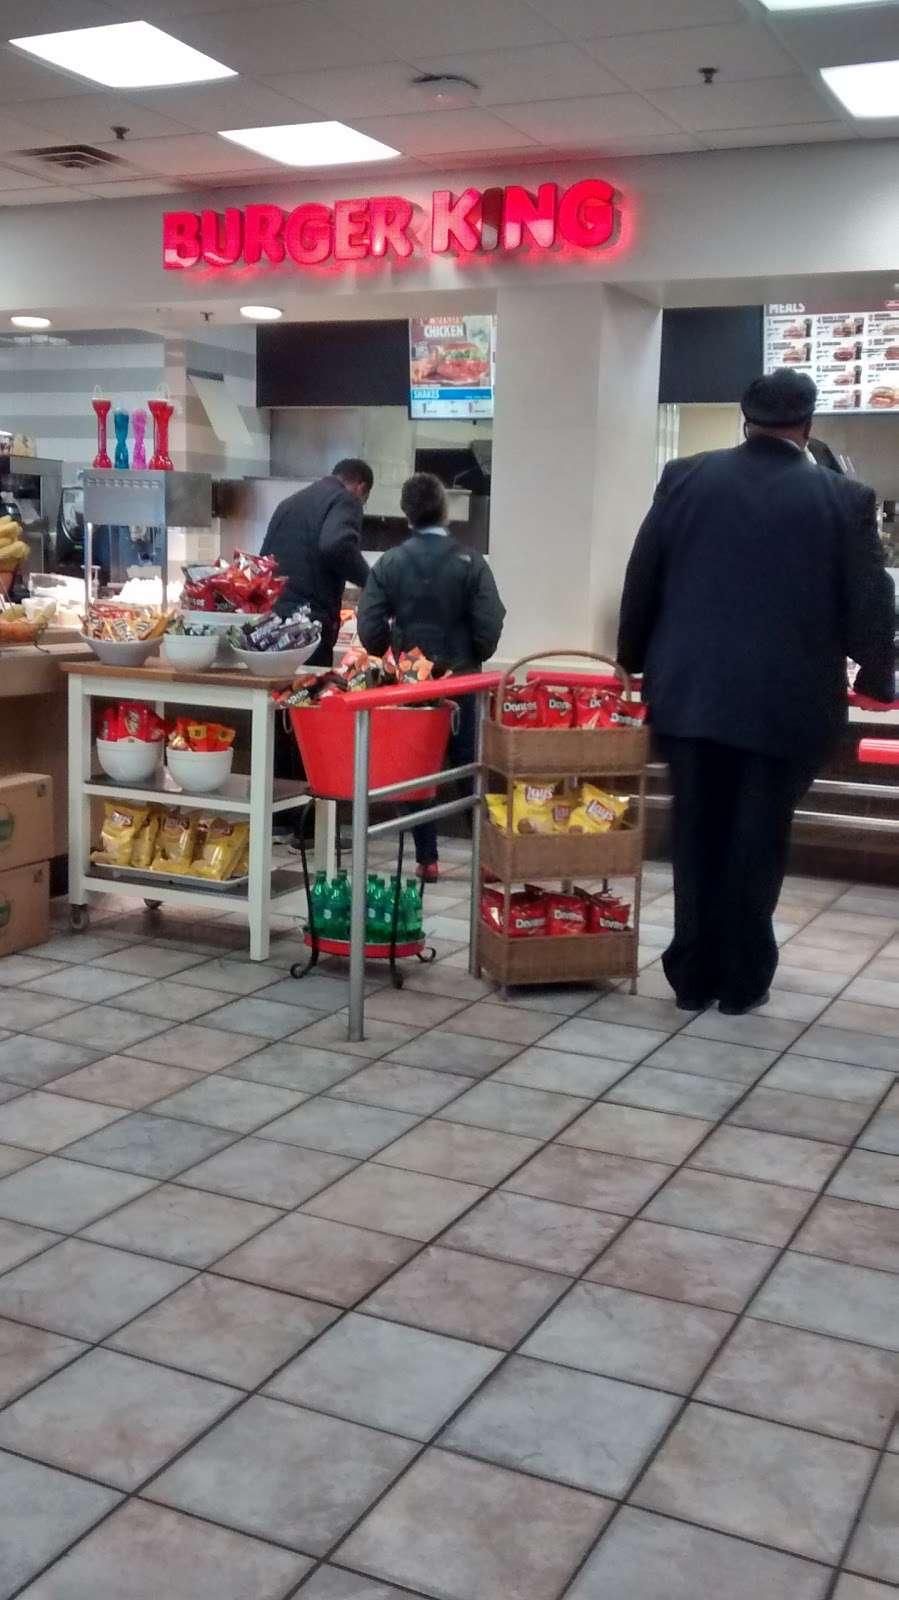 Burger King - restaurant  | Photo 4 of 10 | Address: Hms Host Vince Lombardi Travel Plaz, Ridgefield, NJ 07657, USA | Phone: (201) 943-1171